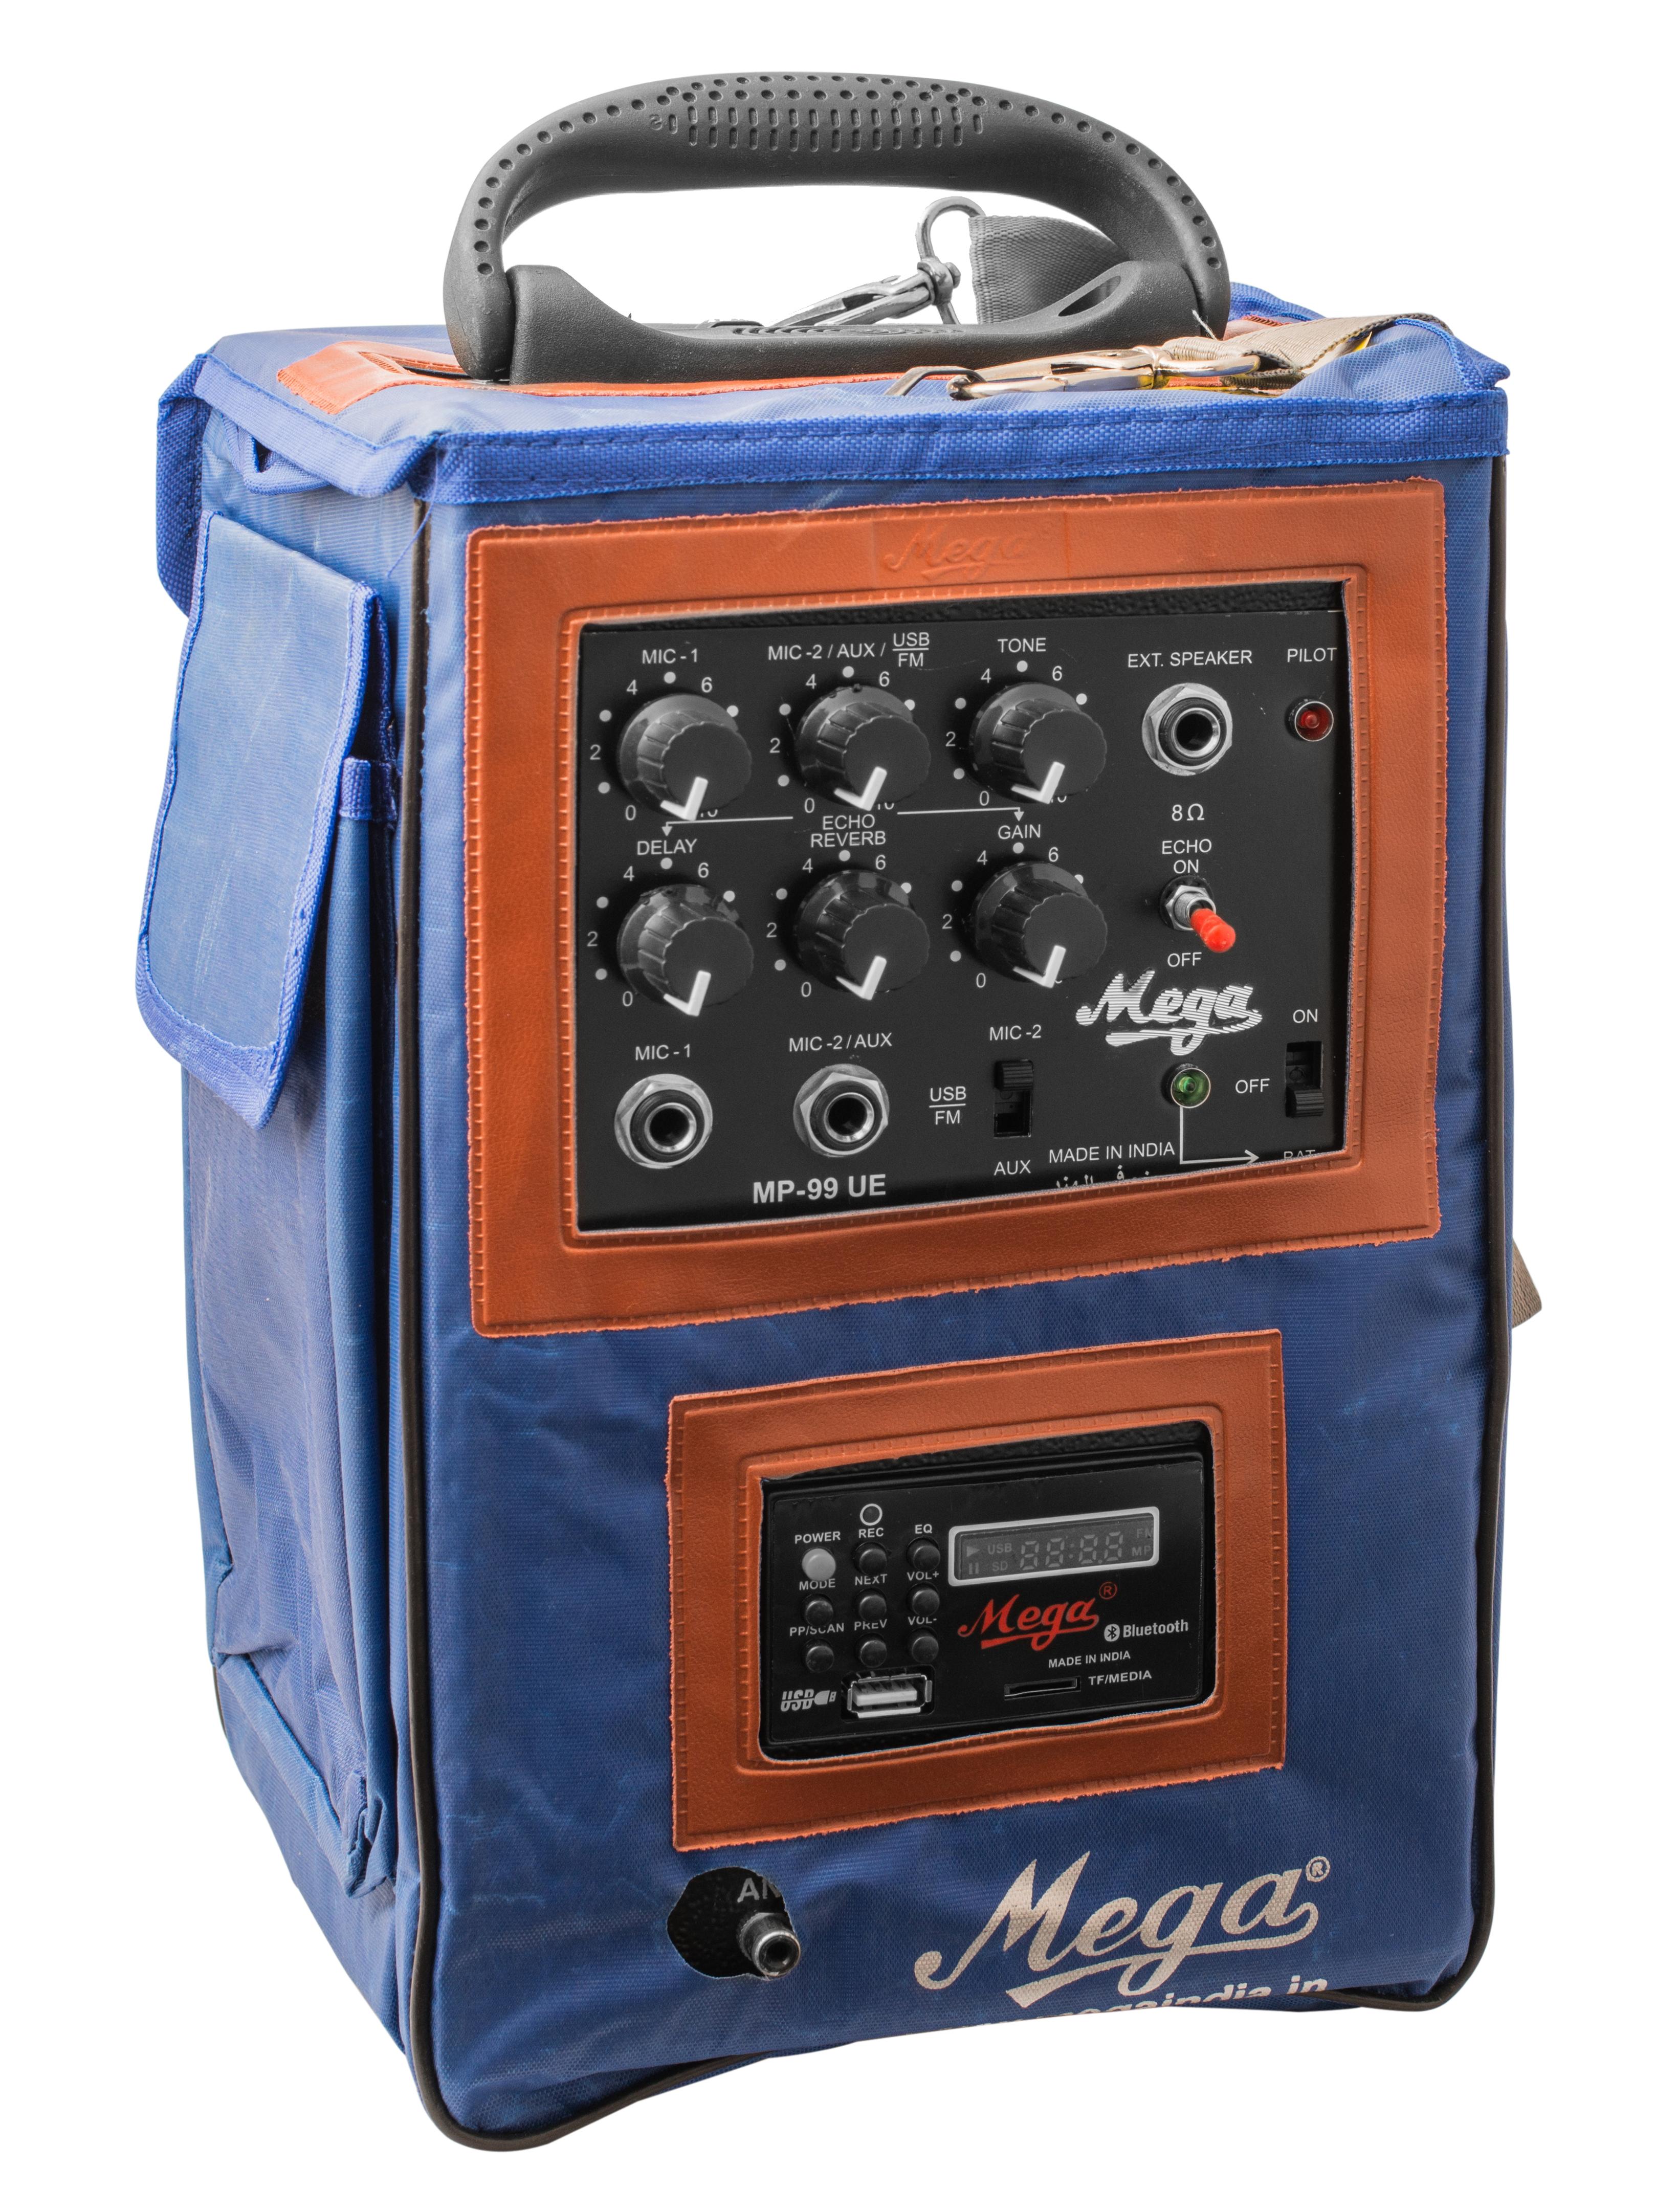 MP-99UE WITH 1 EXTERNAL SPEAKER